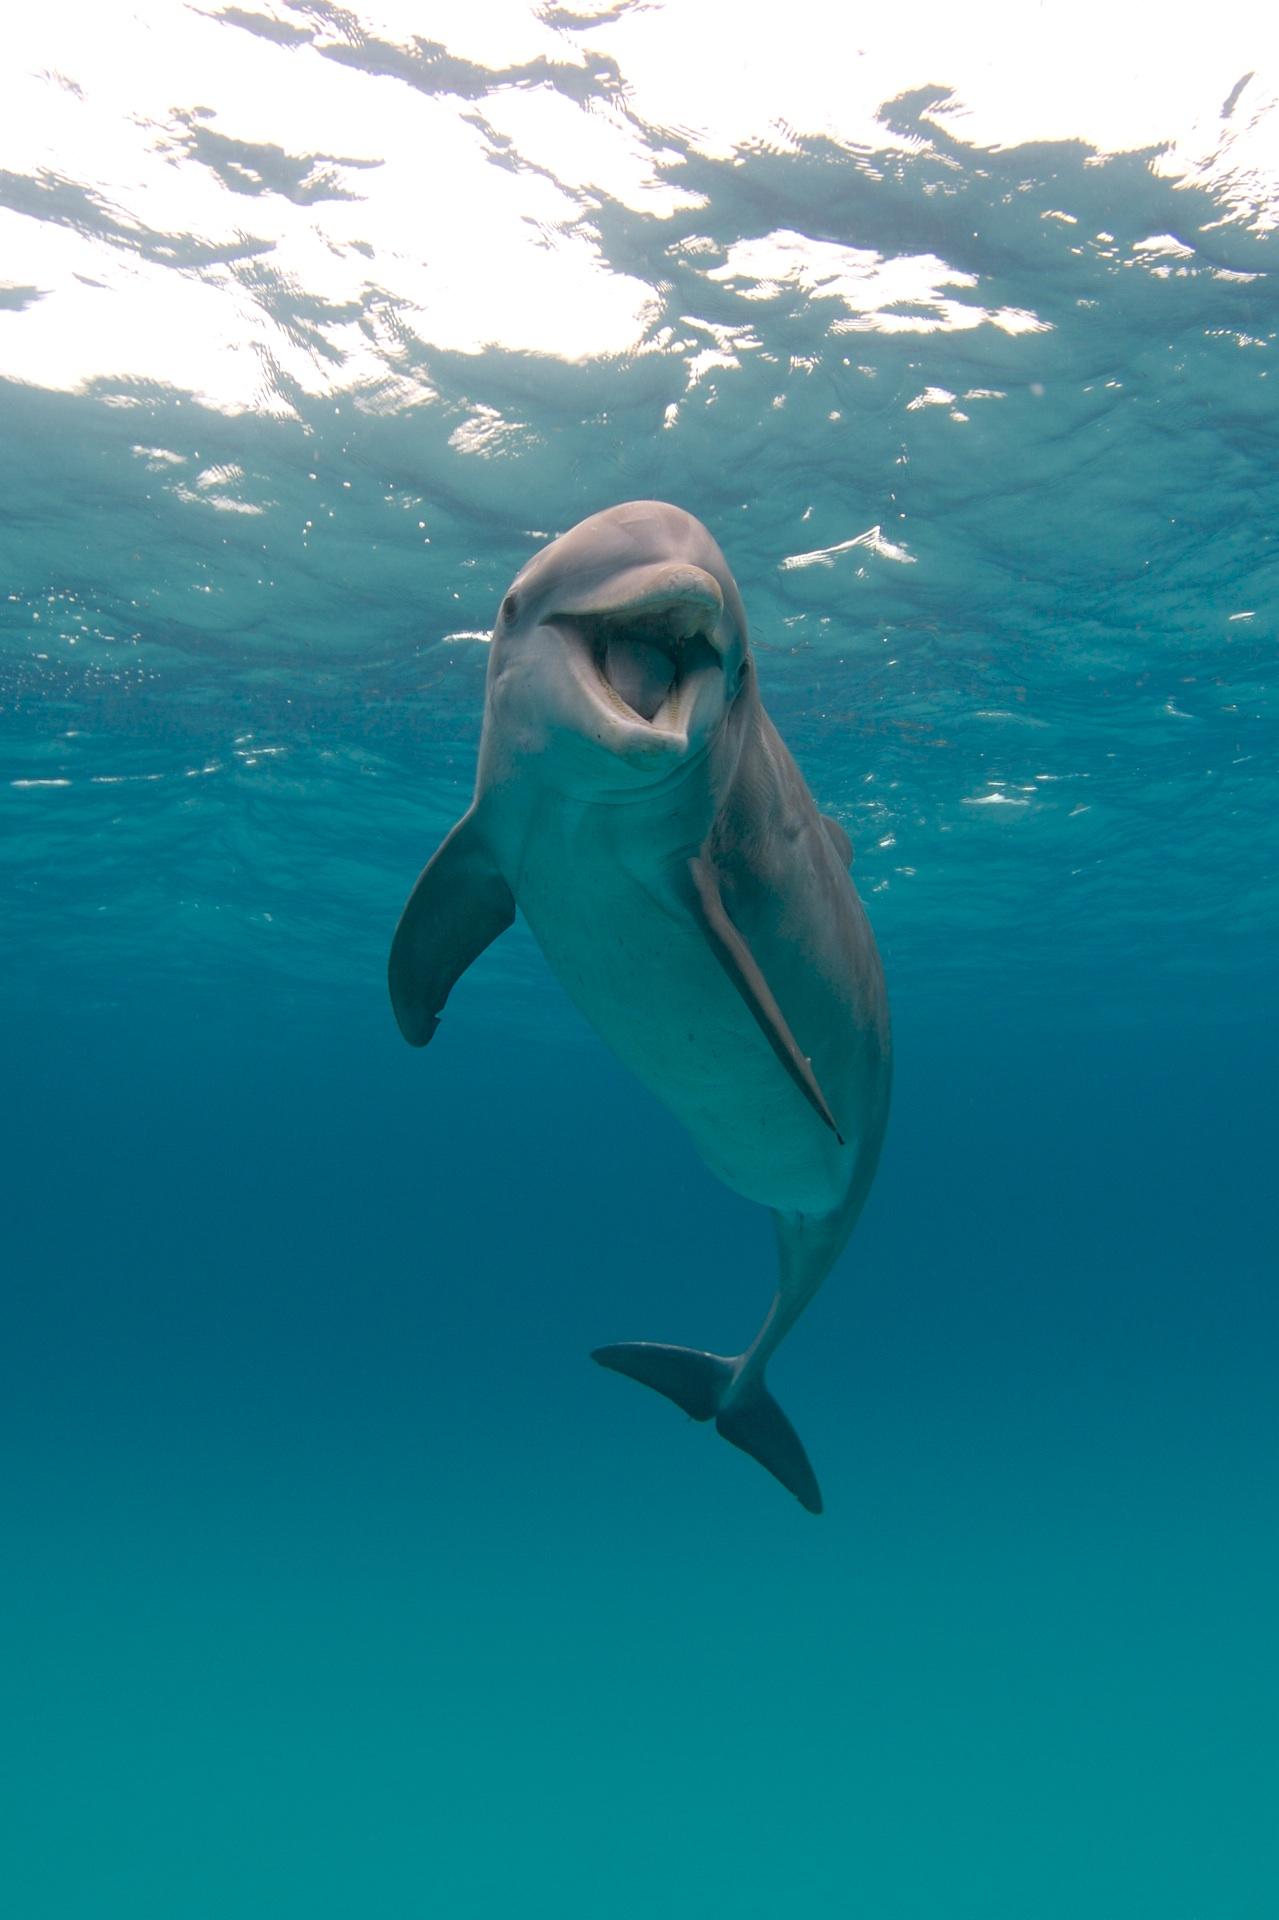 Photo Credits: Dolphin: Eric Cheng